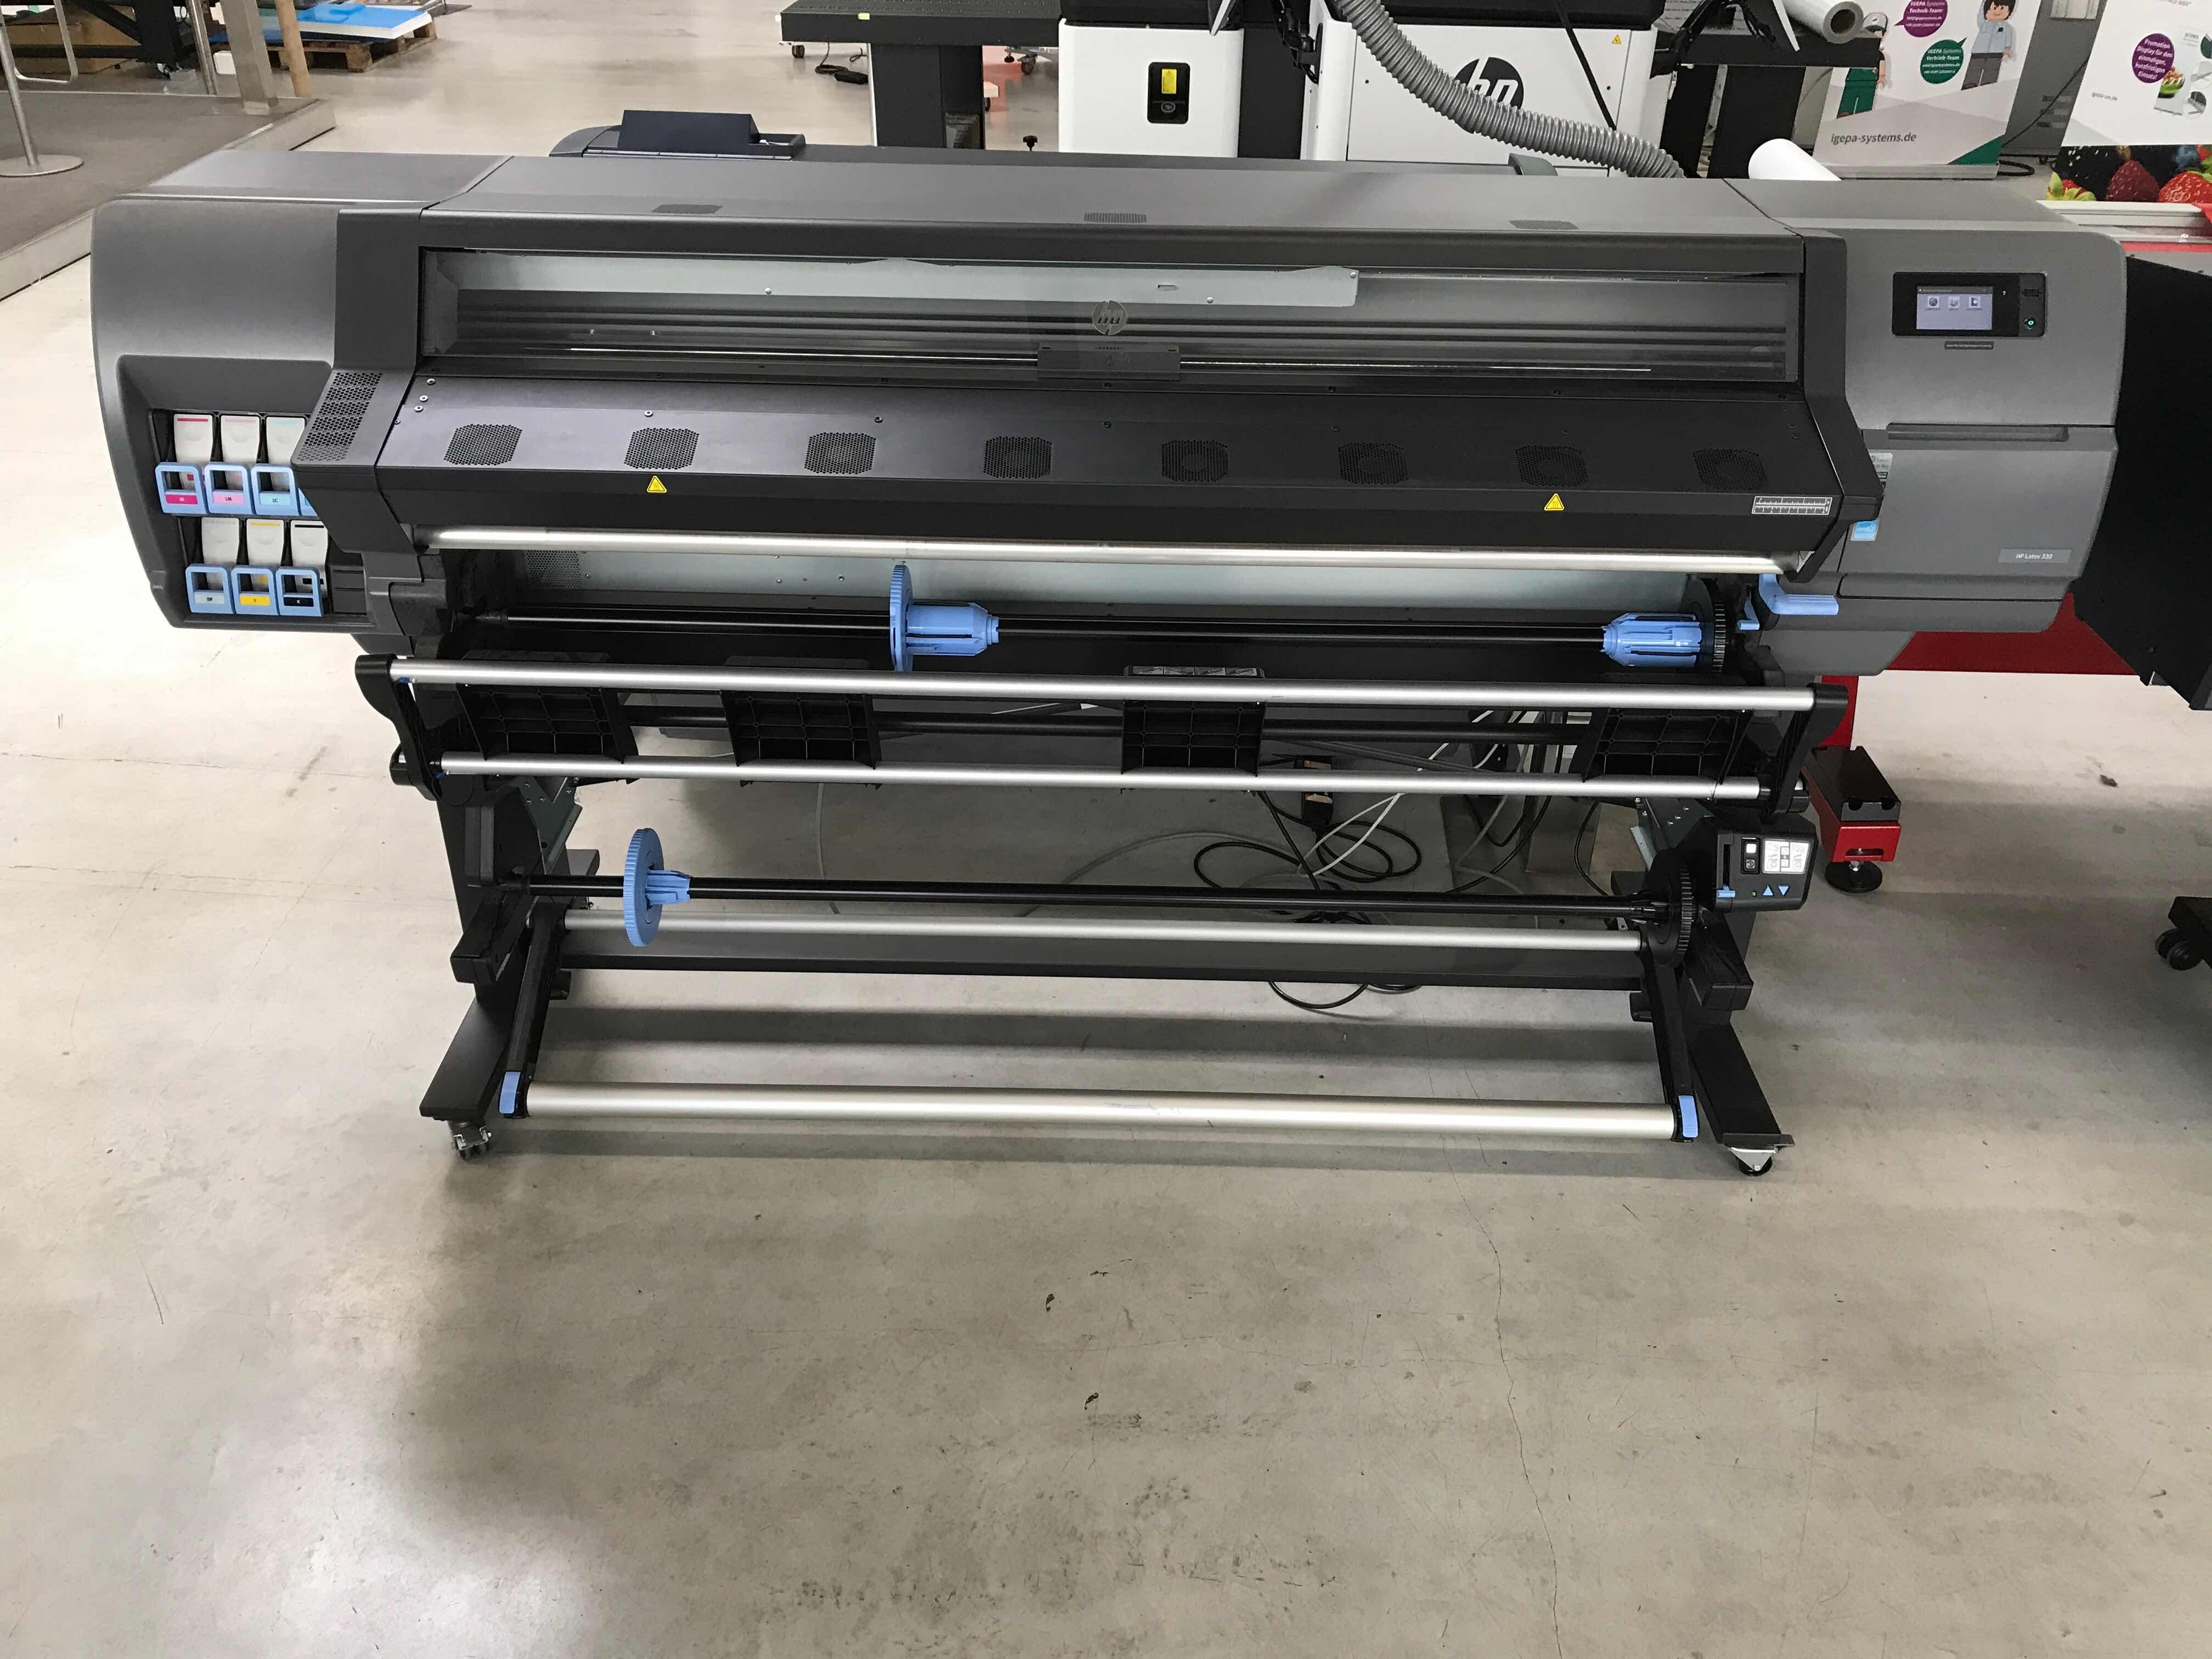 HP Latex 330 - Demogerät